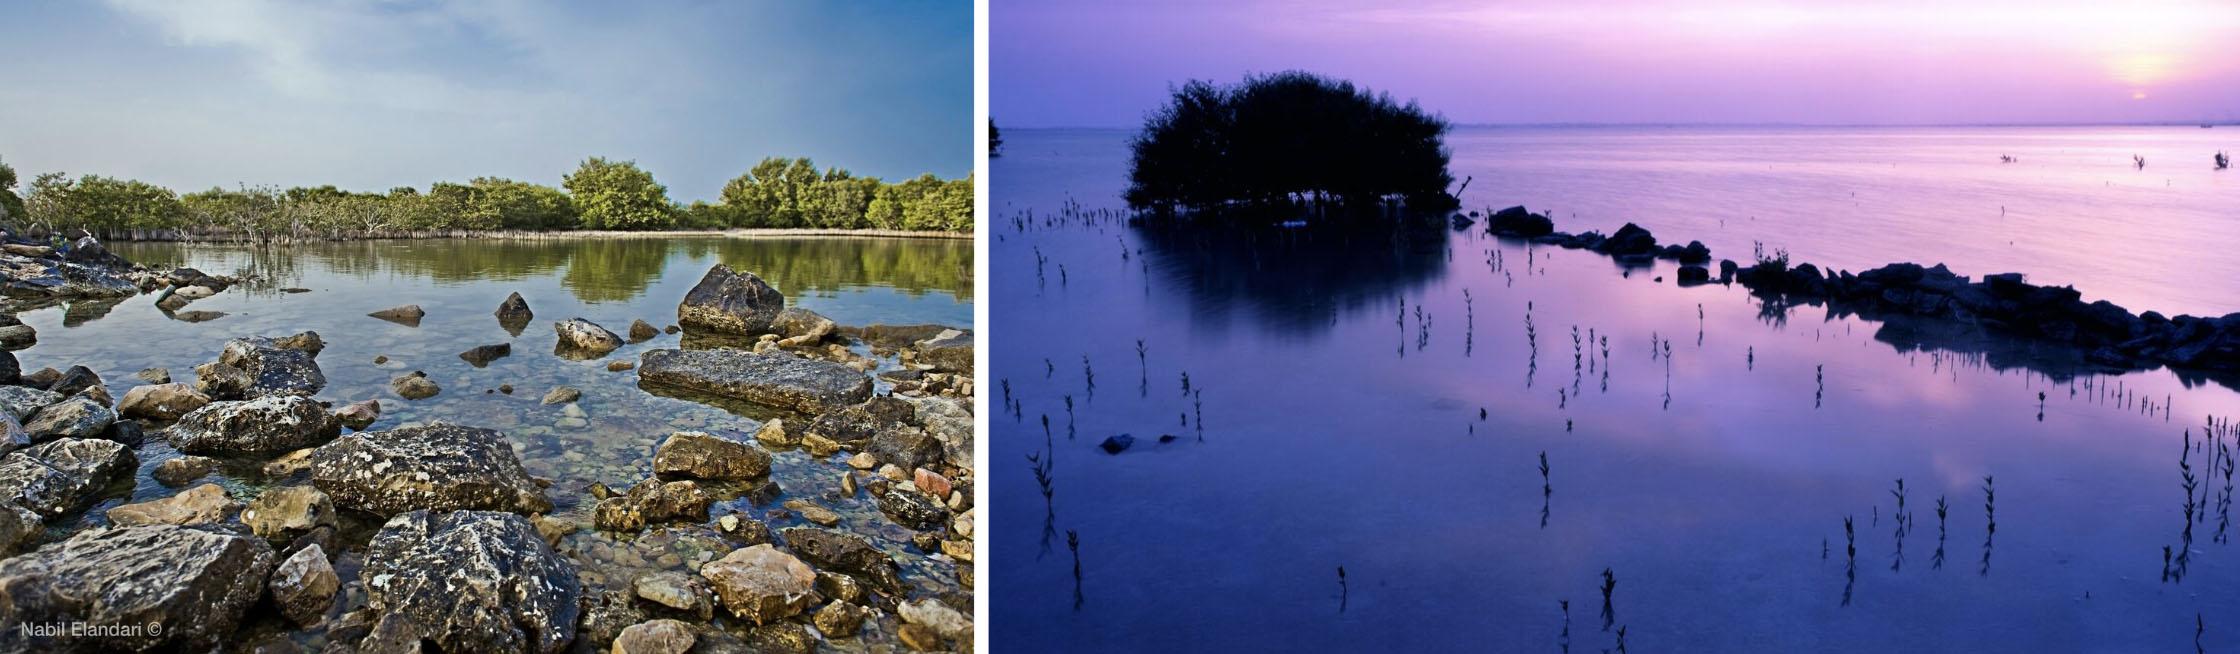 Al Thakira mangrove forest